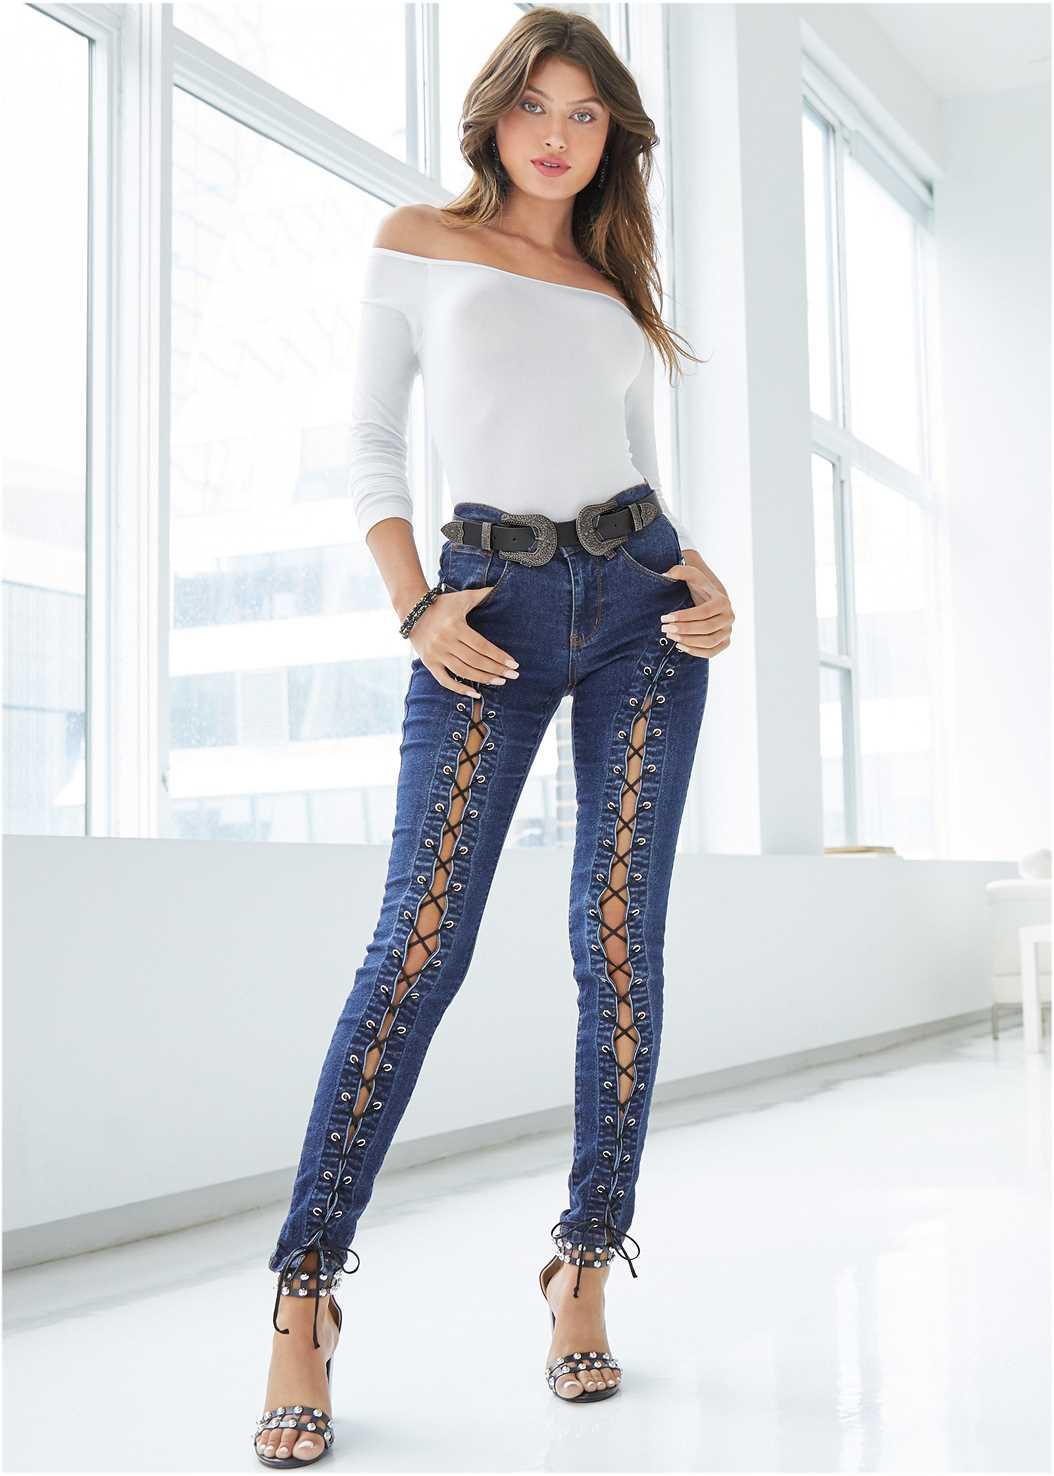 Lace Up Skinny Jeans,Off The Shoulder Top,Beaded Tassel Earrings,T-Strap Ankle Heels,Rhinestone Mini Crossbody